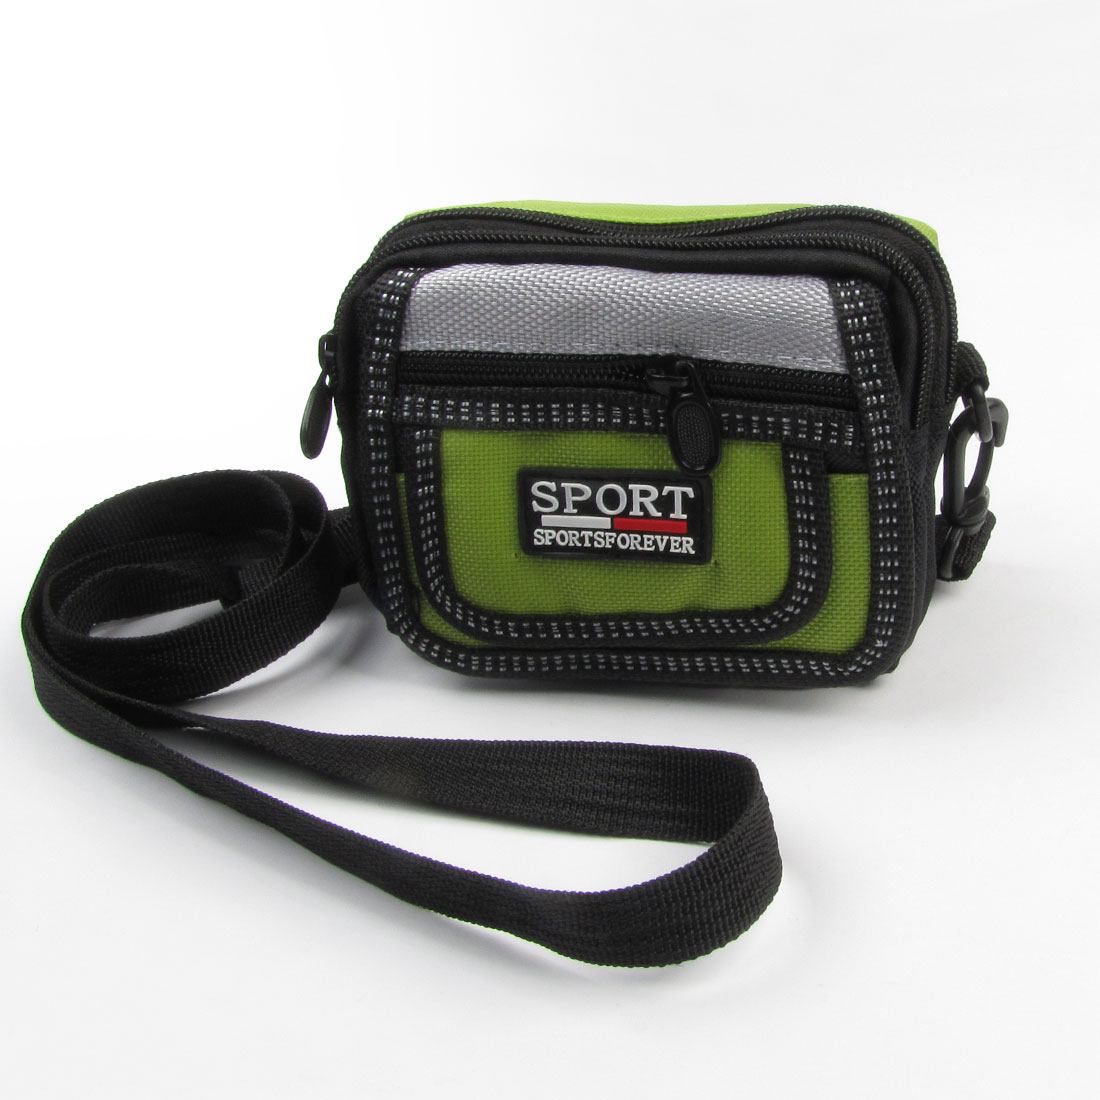 Outdoor Black Light Green 2 Compartment Nylon Phone Digital Camera Bag Case